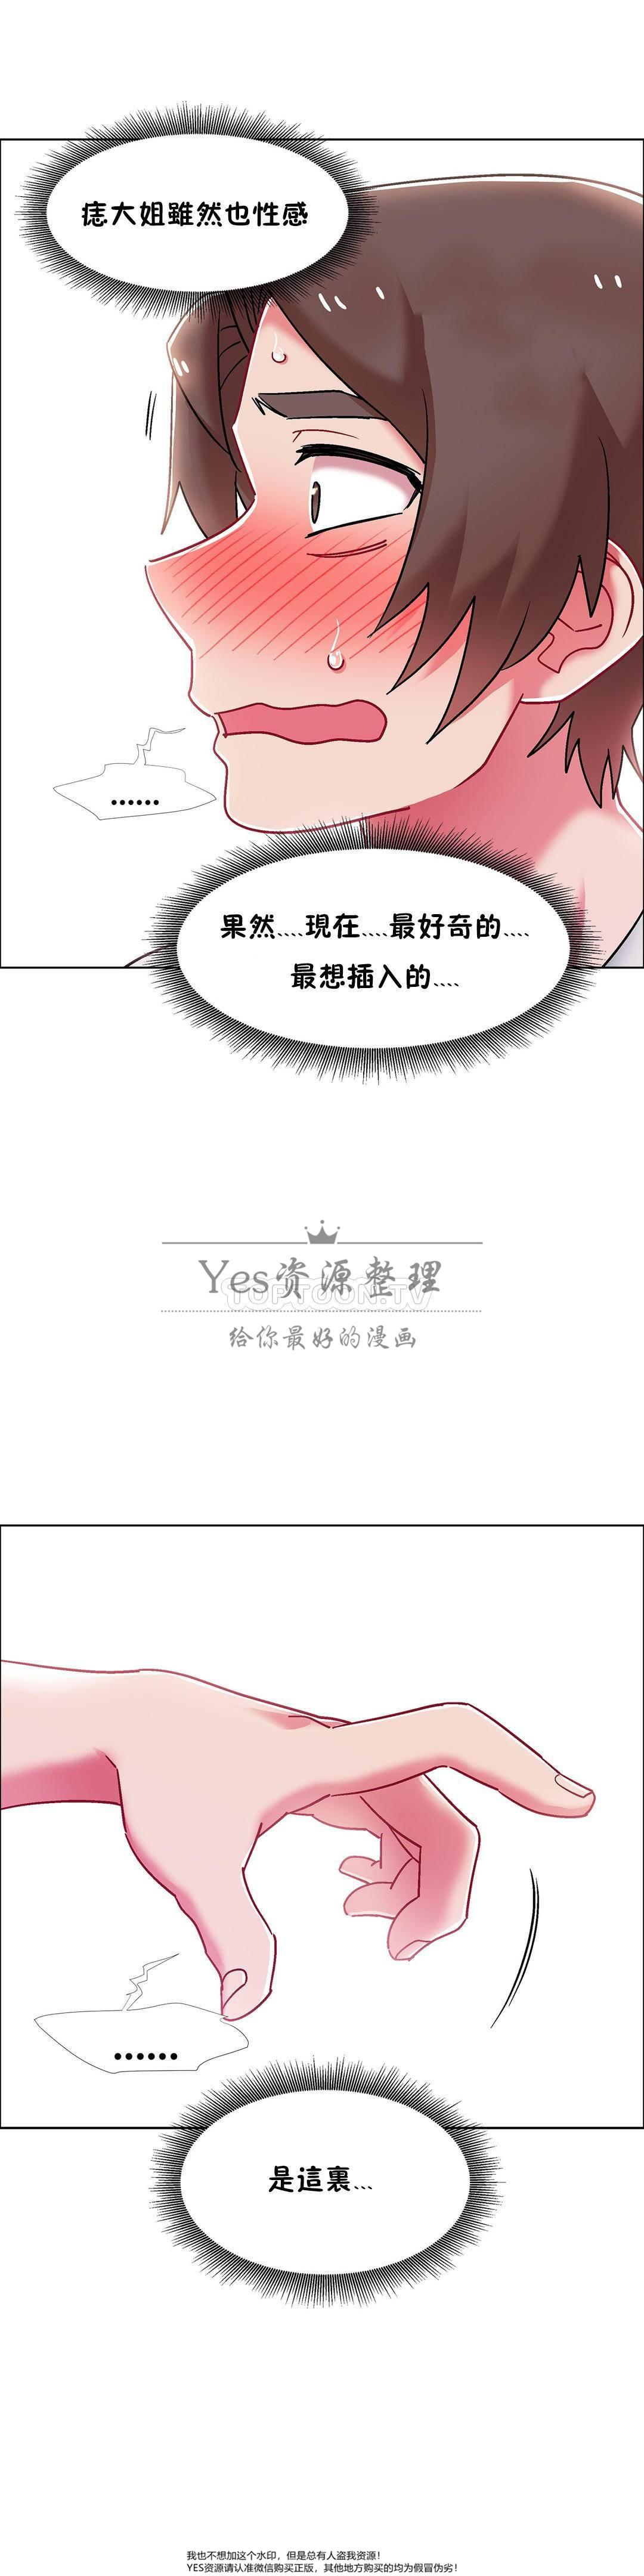 [Studio Wannabe] Rental Girls | 出租女郎 Ch. 33-58 [Chinese]  第二季 完结 579